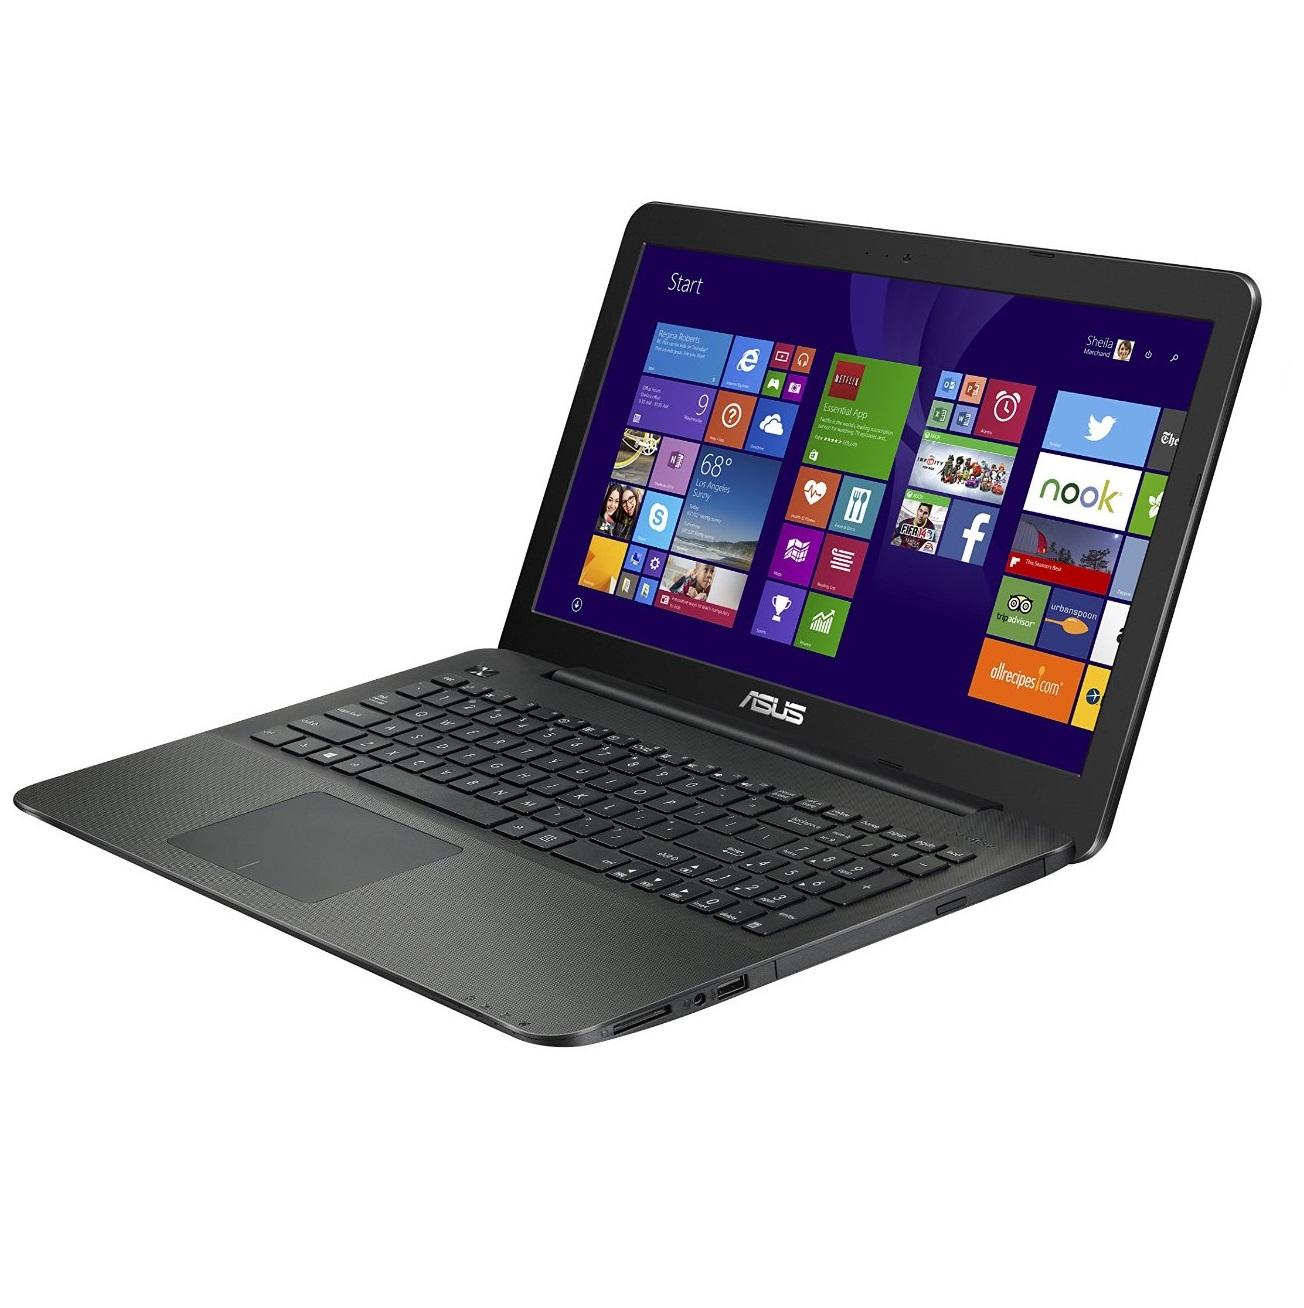 Laptop Asus X554LA-XX1077D core i3 5010U 4GB/500GB/15.6